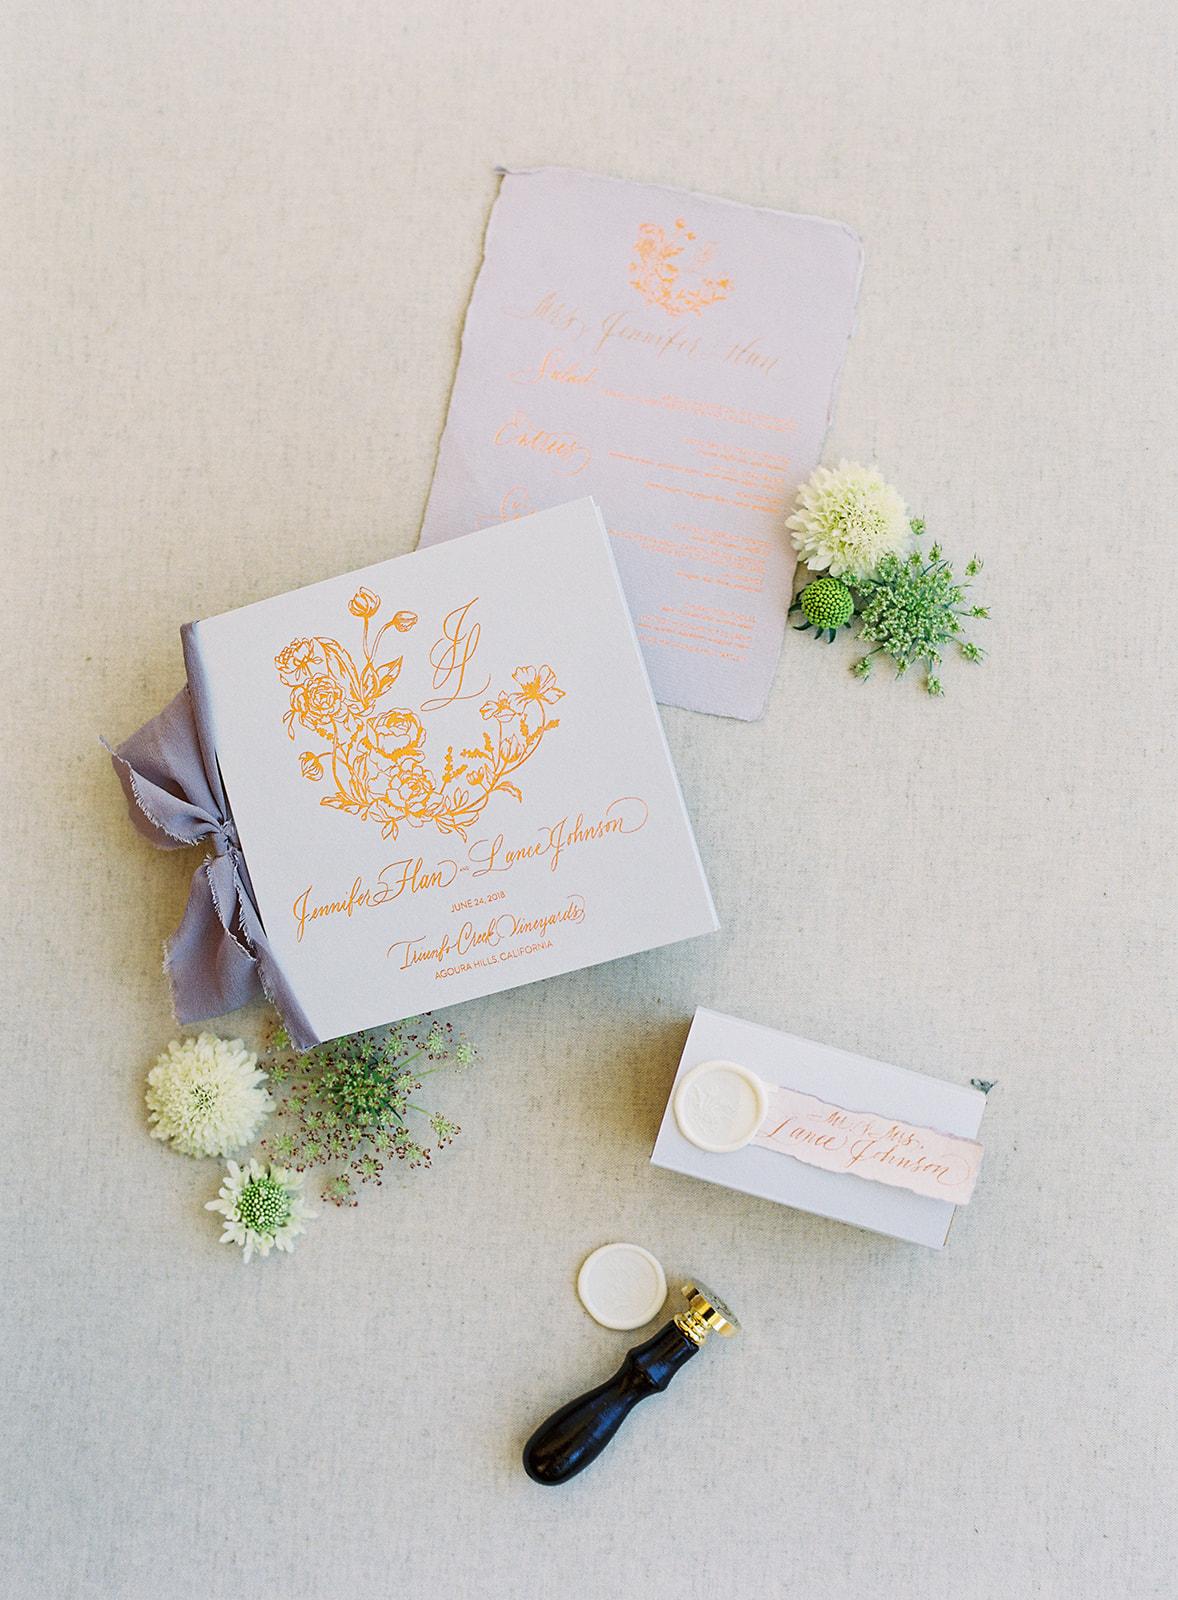 Triunfo_Creek_Winery_Wedding-2-Jen-Huang-JL-467-Jen-Huang-009974-R1-001.jpg